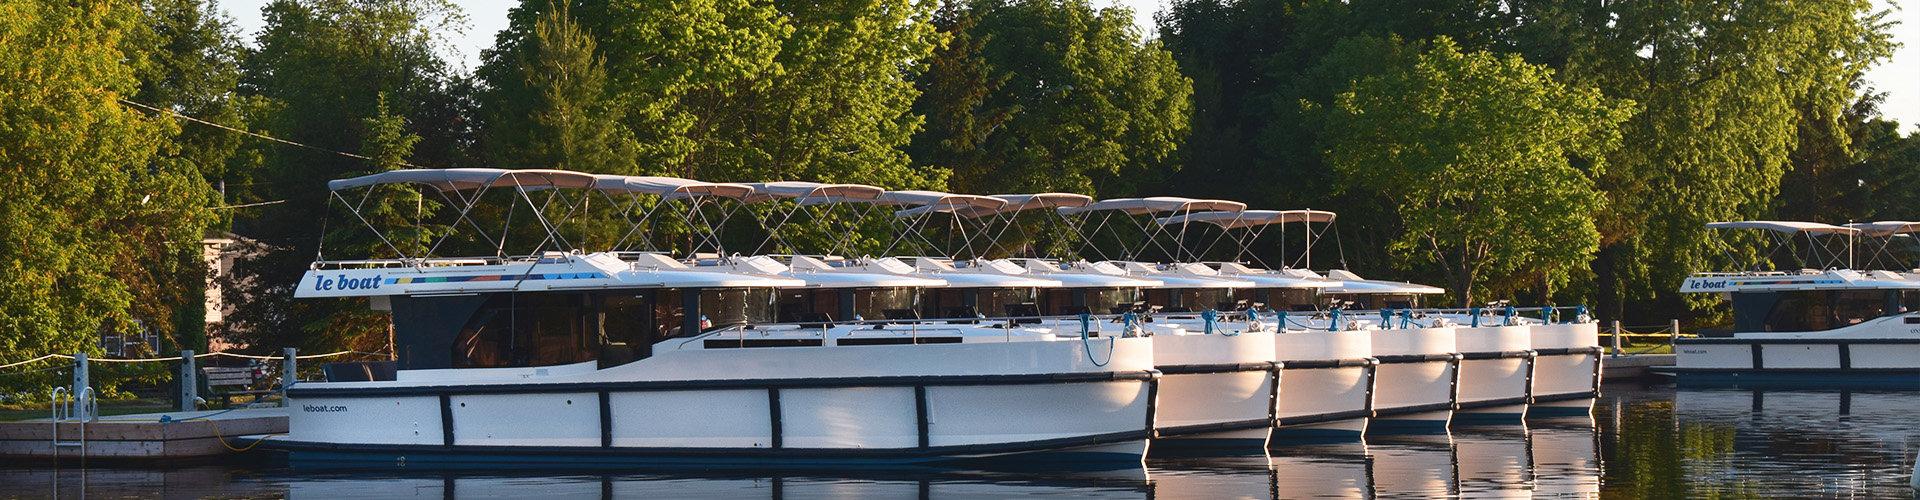 Horizon boats moored